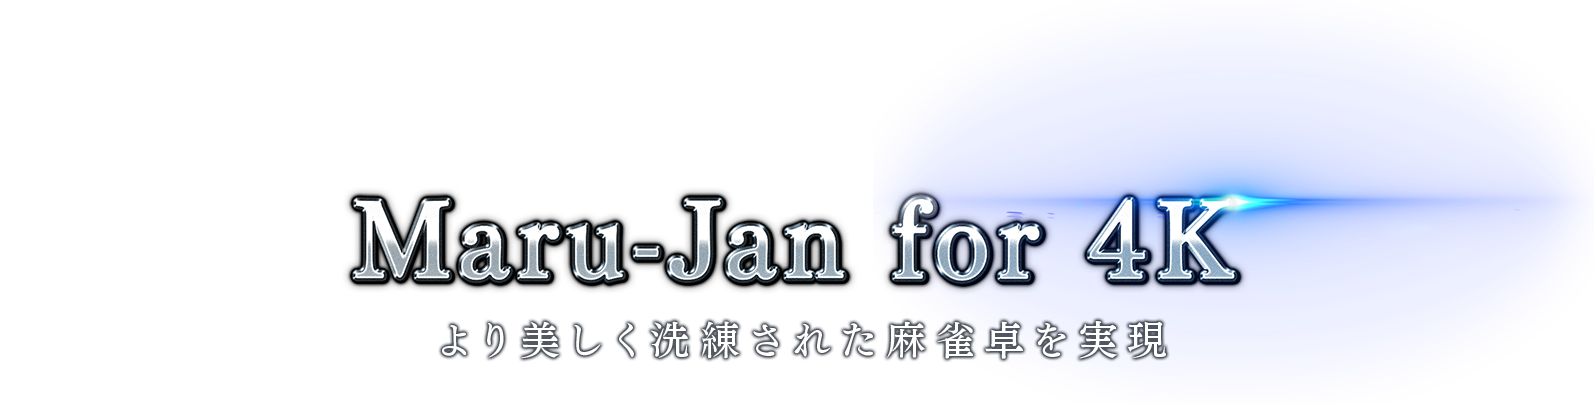 Maru-Jan for 4K より美しく洗練された麻雀卓を実現